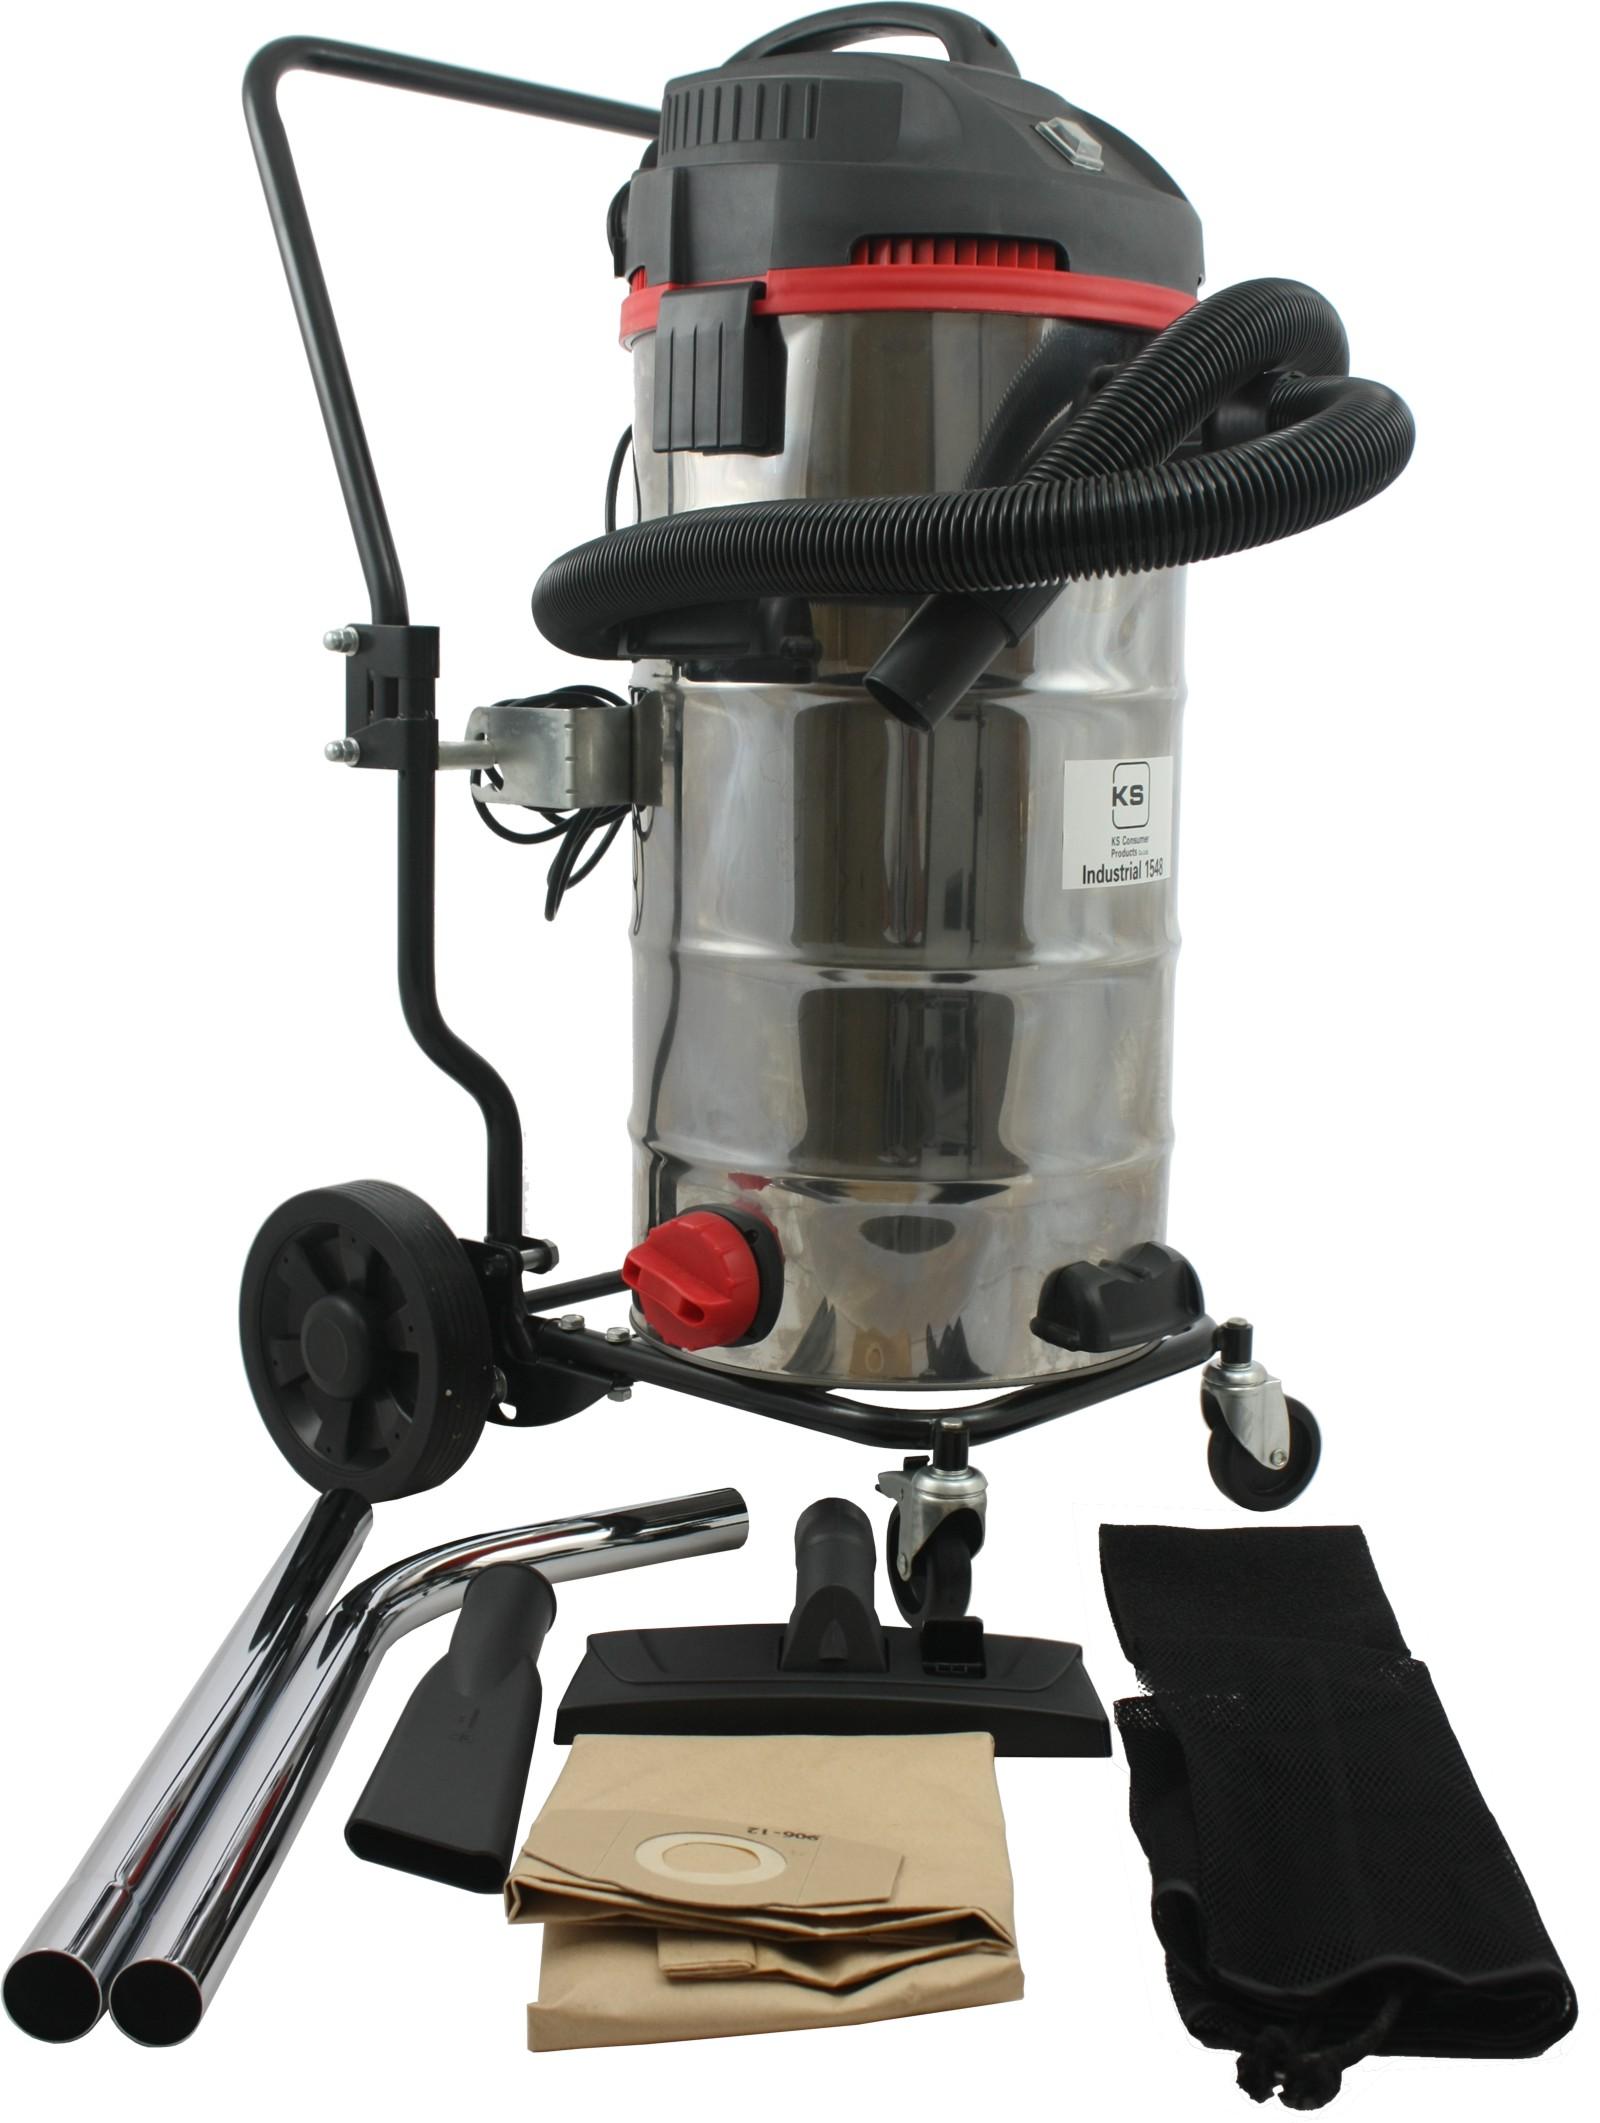 industriesauger nasssauger industrial 1548 rollwagen zubeh r ebay. Black Bedroom Furniture Sets. Home Design Ideas